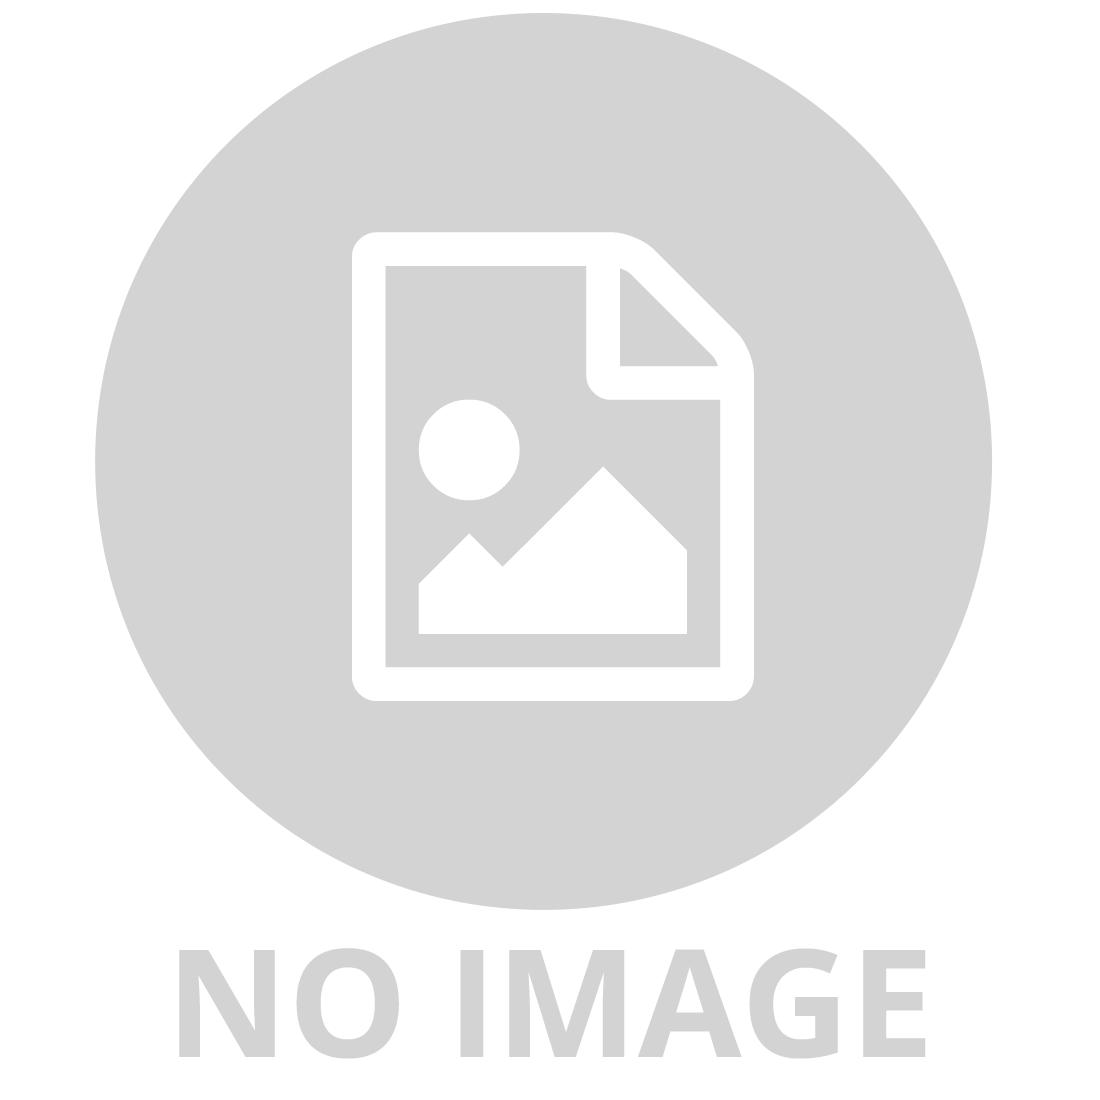 WASGIJ 1000 PIECE MYSTERY PUZZLE #22 WASGIJ STUDIO TOUR